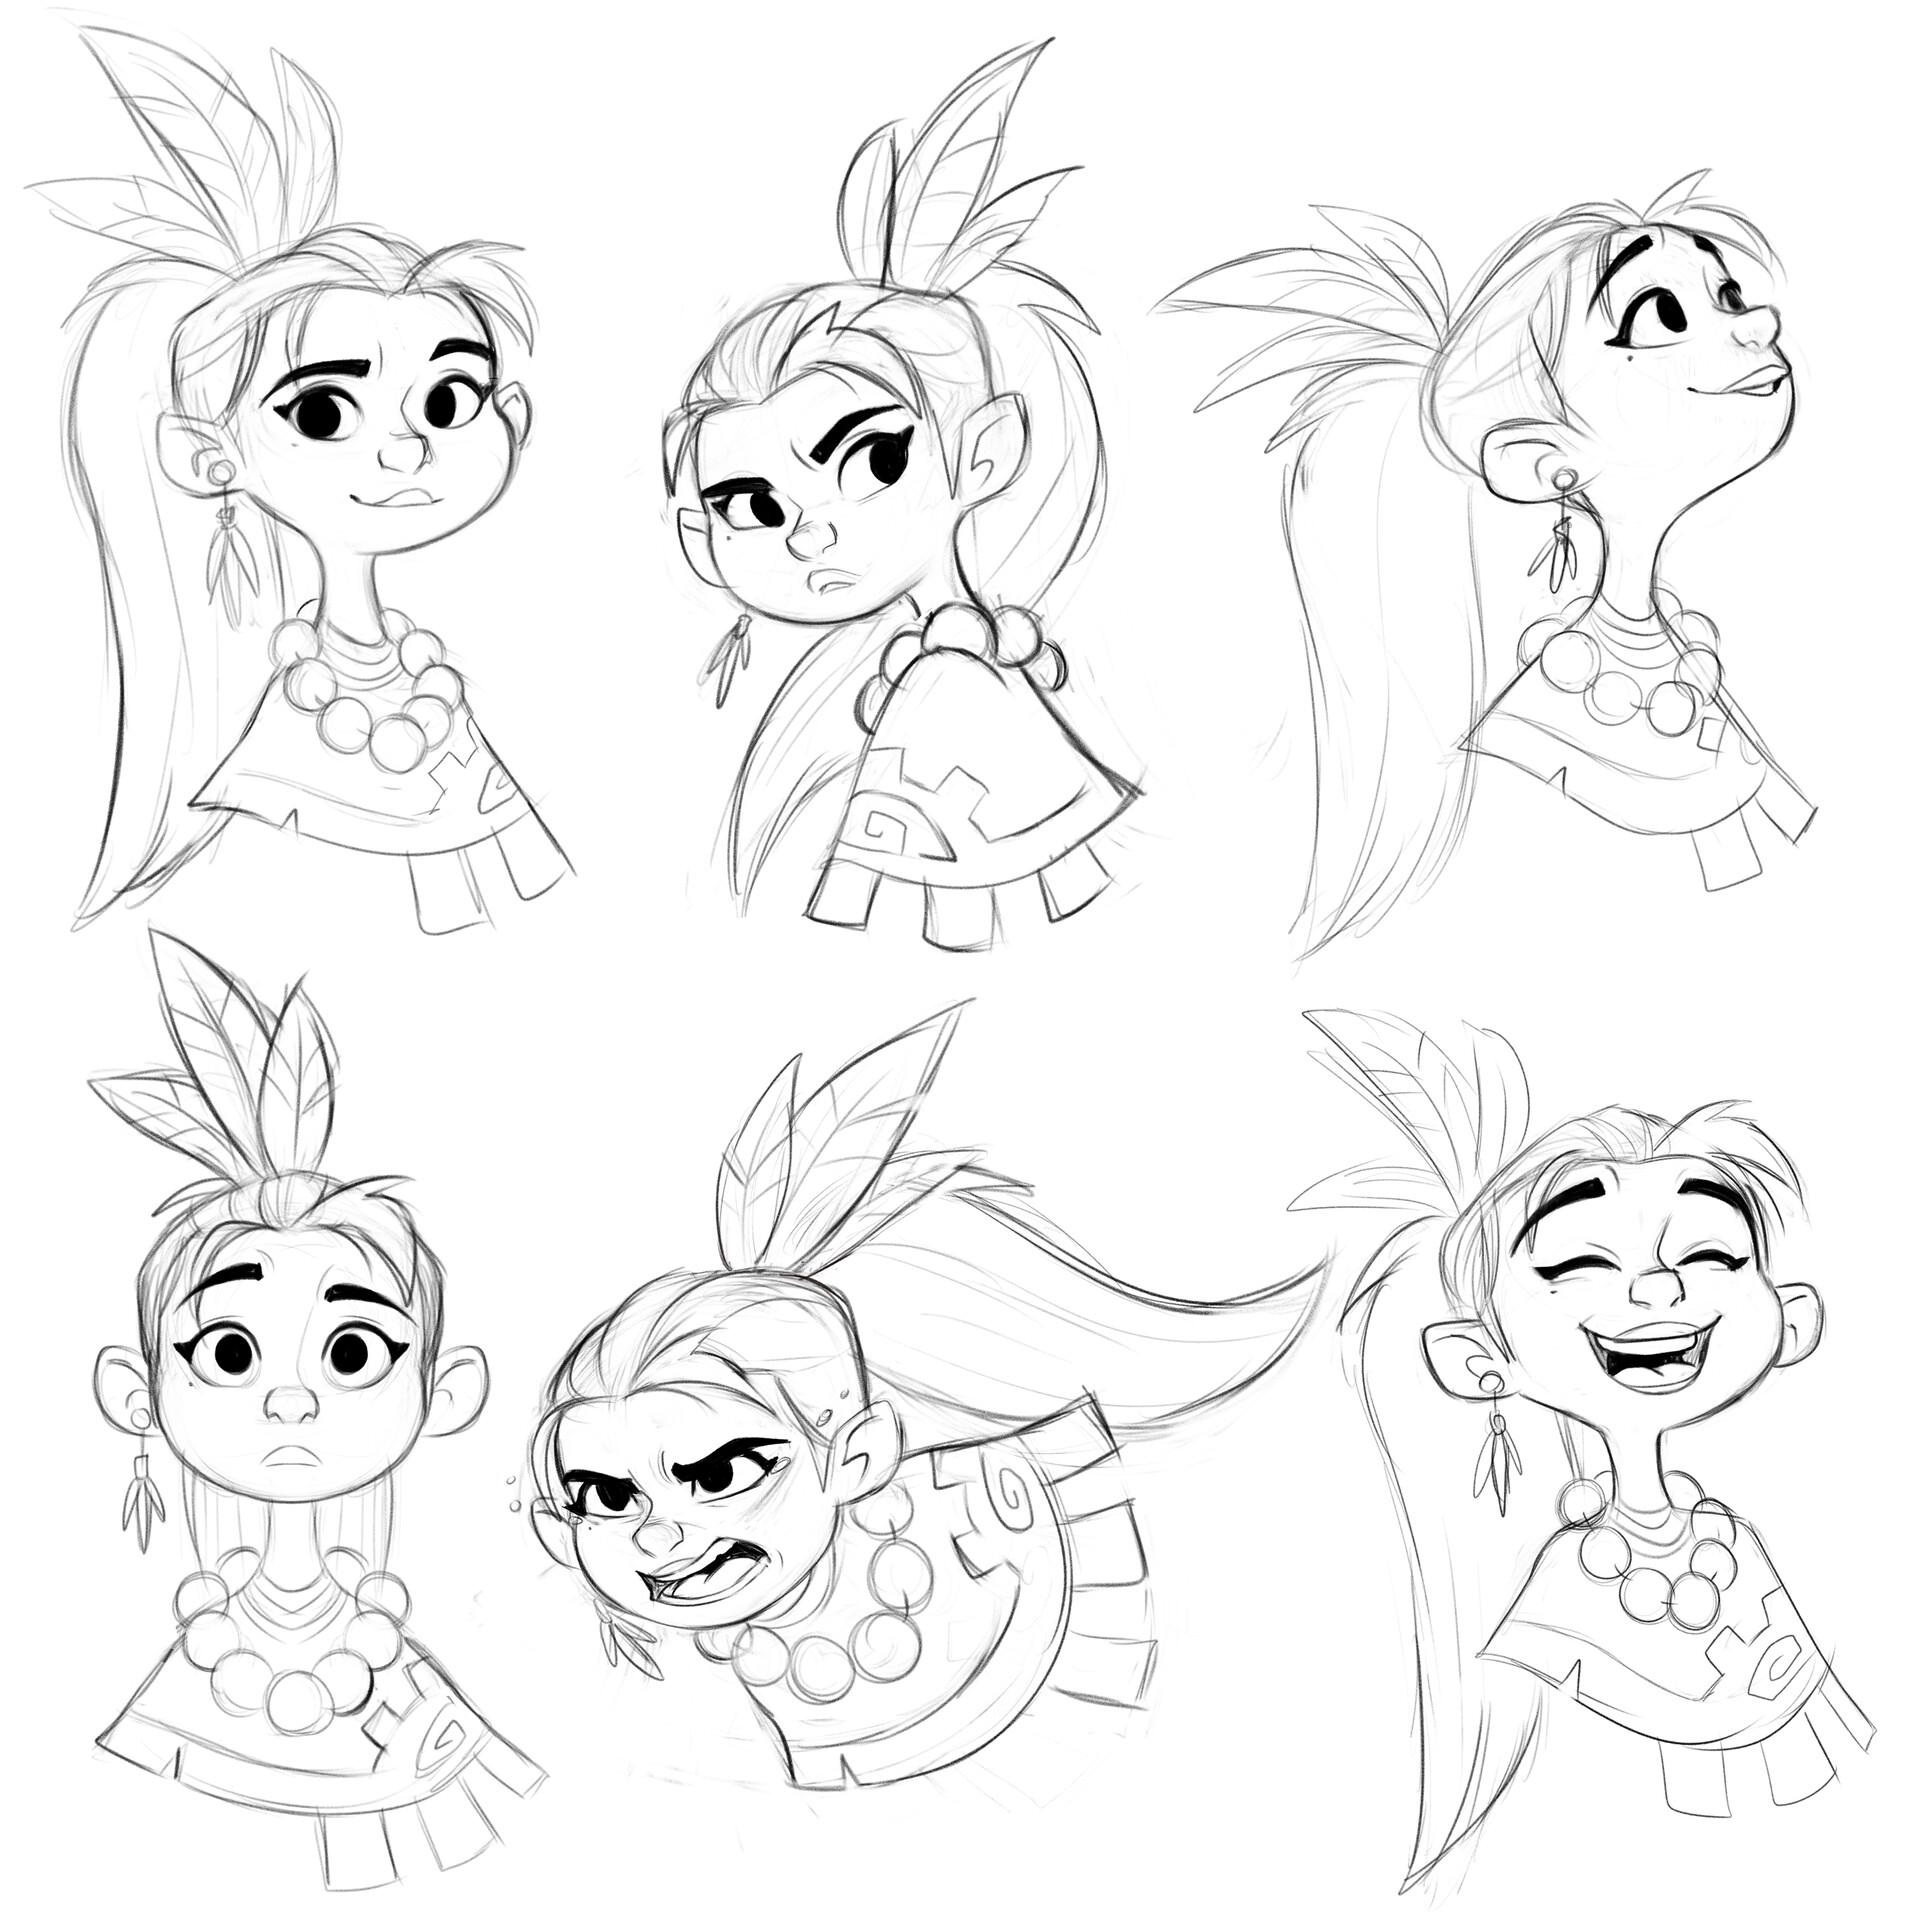 Luigi lucarelli tribal girl expressions sketches